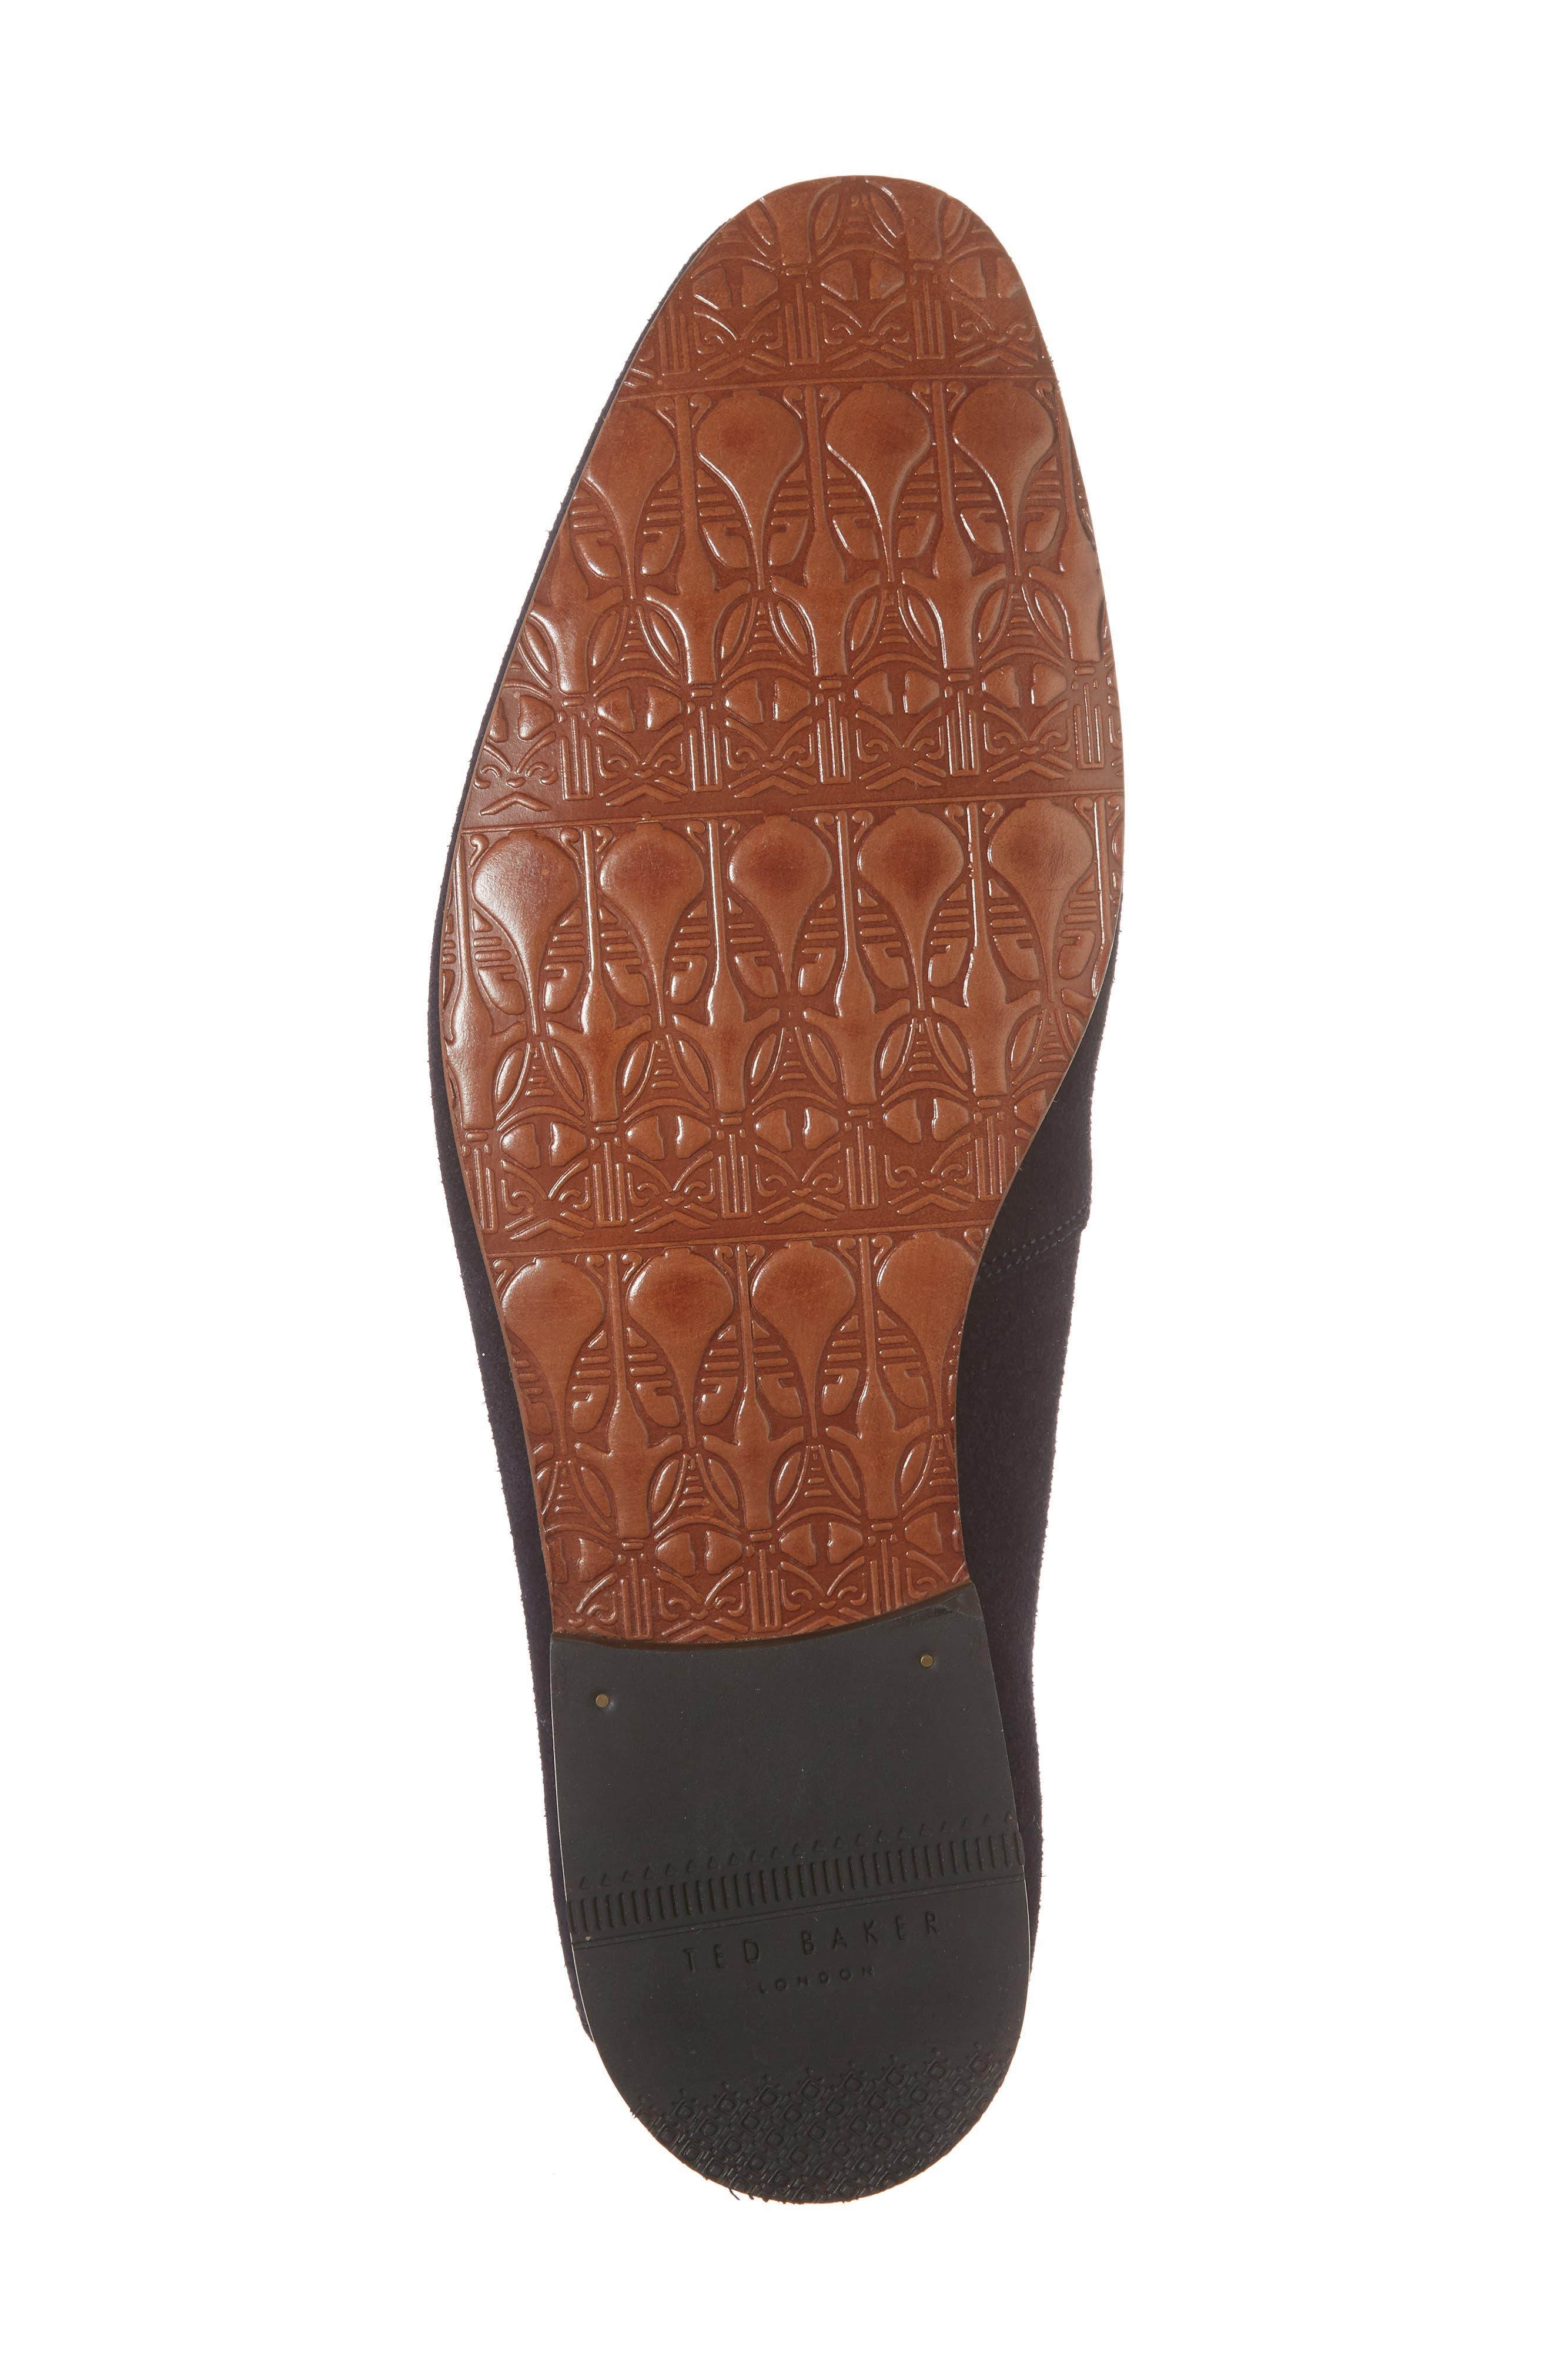 Hoppken Convertible Knotted Loafer,                             Alternate thumbnail 6, color,                             Dark Blue Suede